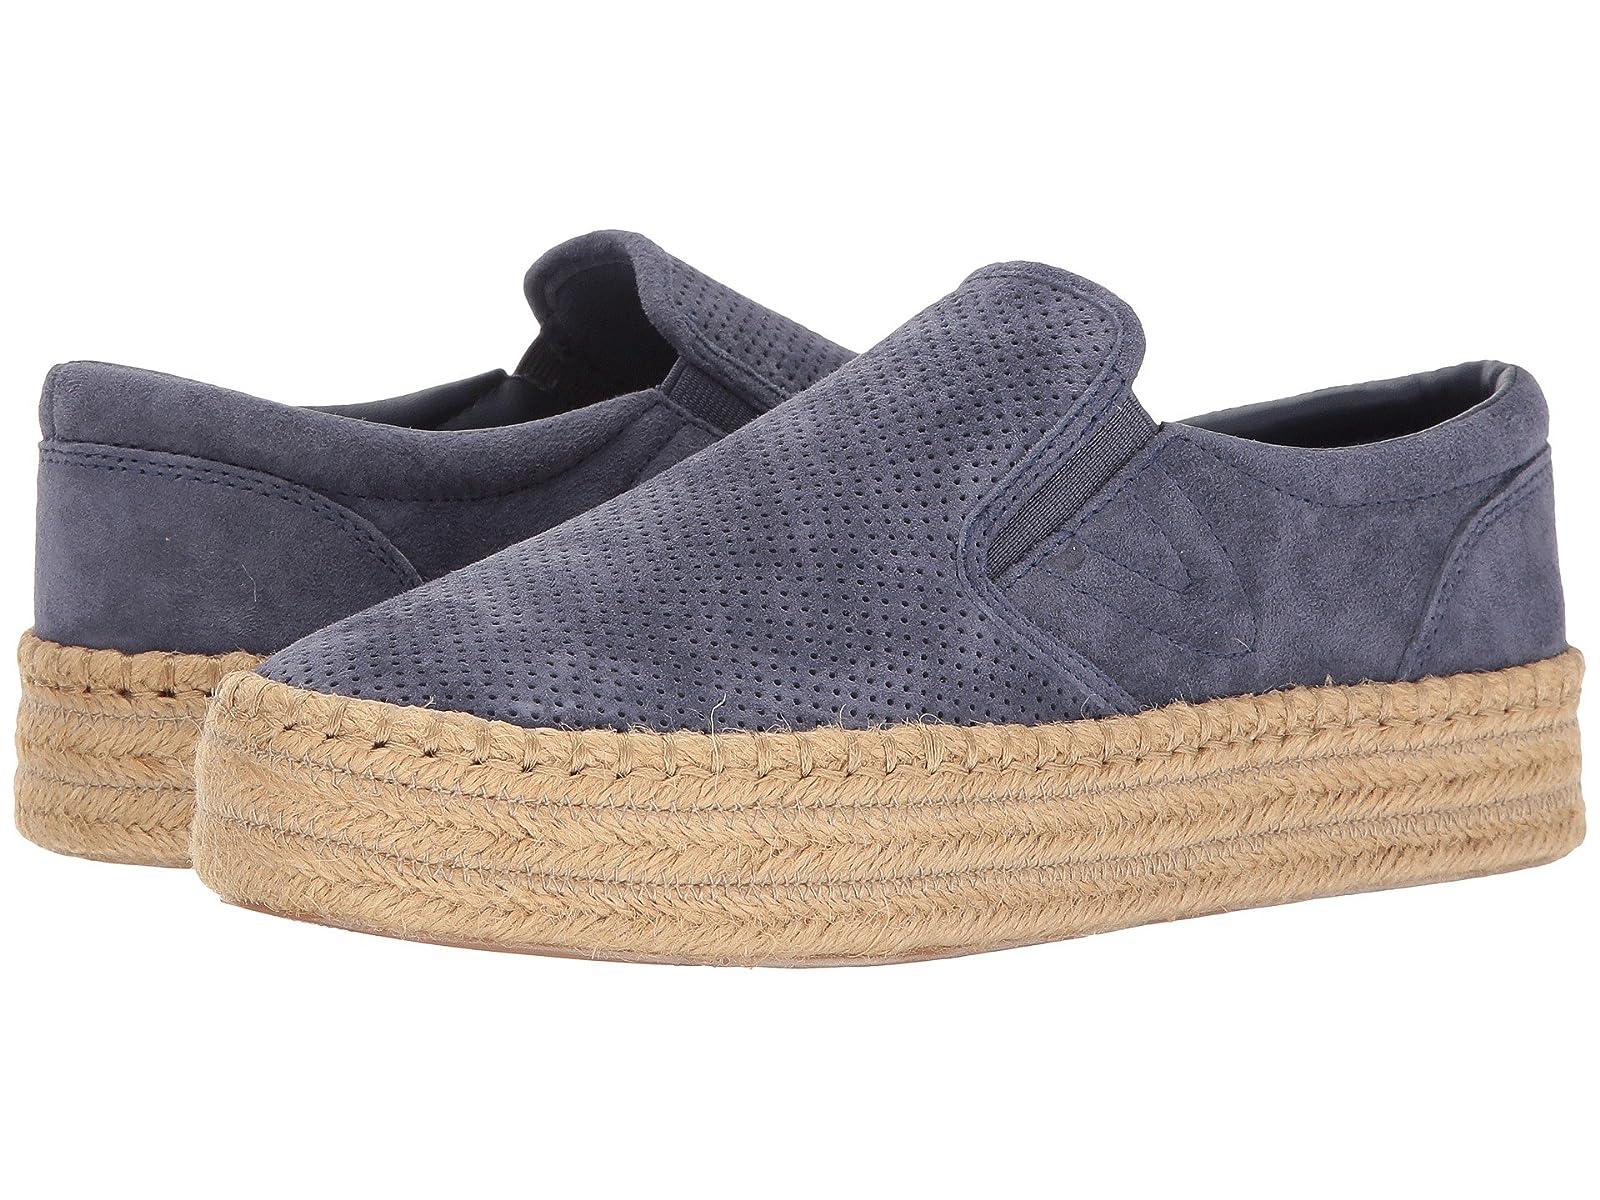 Tretorn Emilia3Cheap and distinctive eye-catching shoes